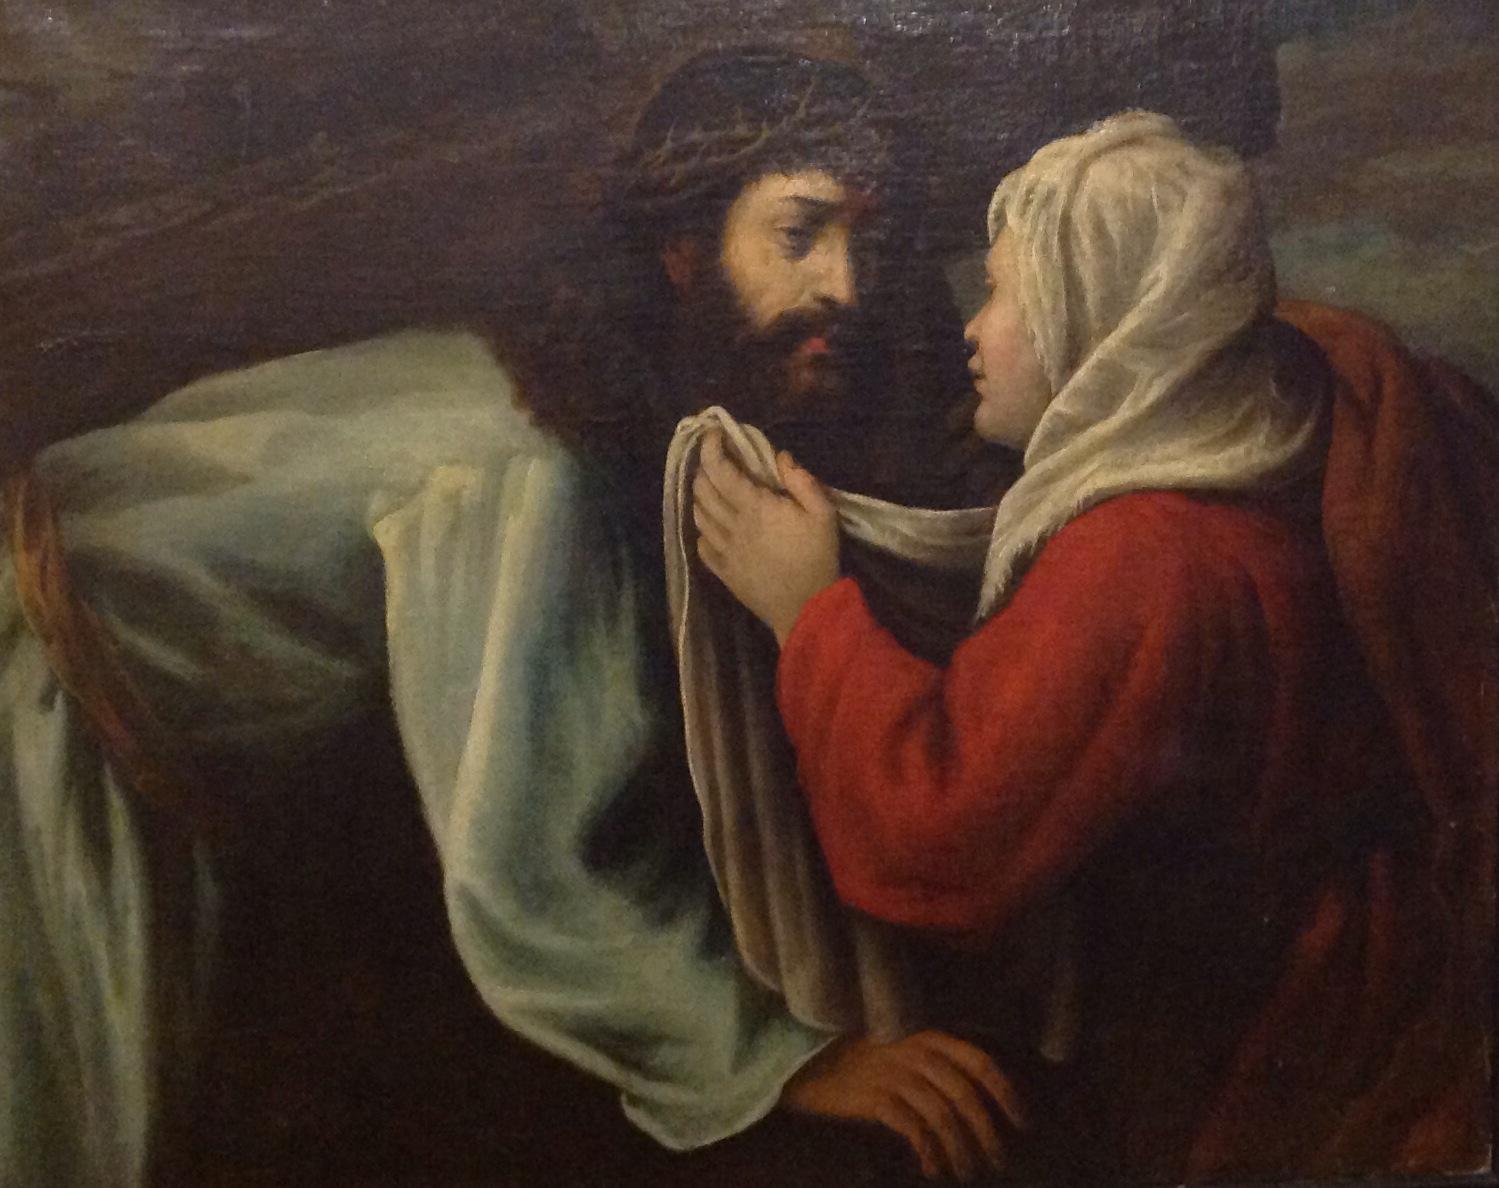 VENETIAN SCHOOL, CIRCA 1600 Christ on the road to Calvary with Saint Veronica, framed. (89cm x 64cm)